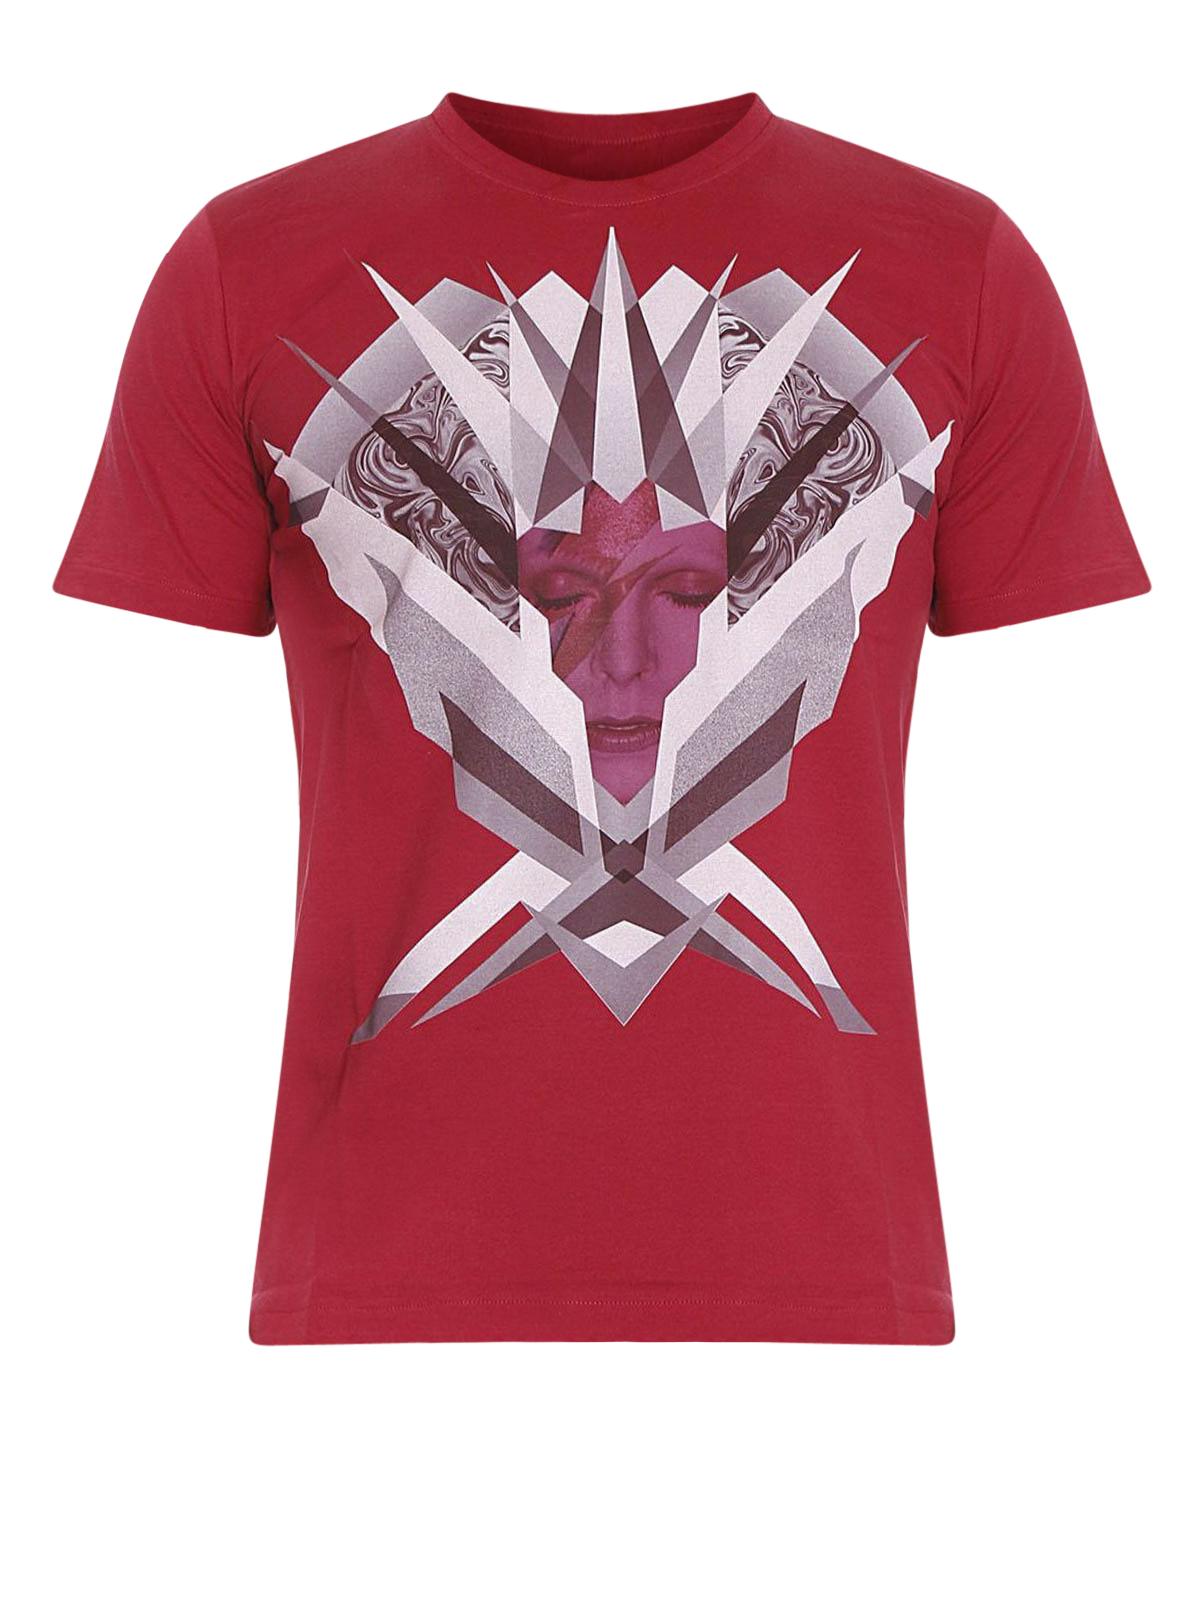 David bowie printed cotton t shirt by john richmond t for Richmond t shirt printing